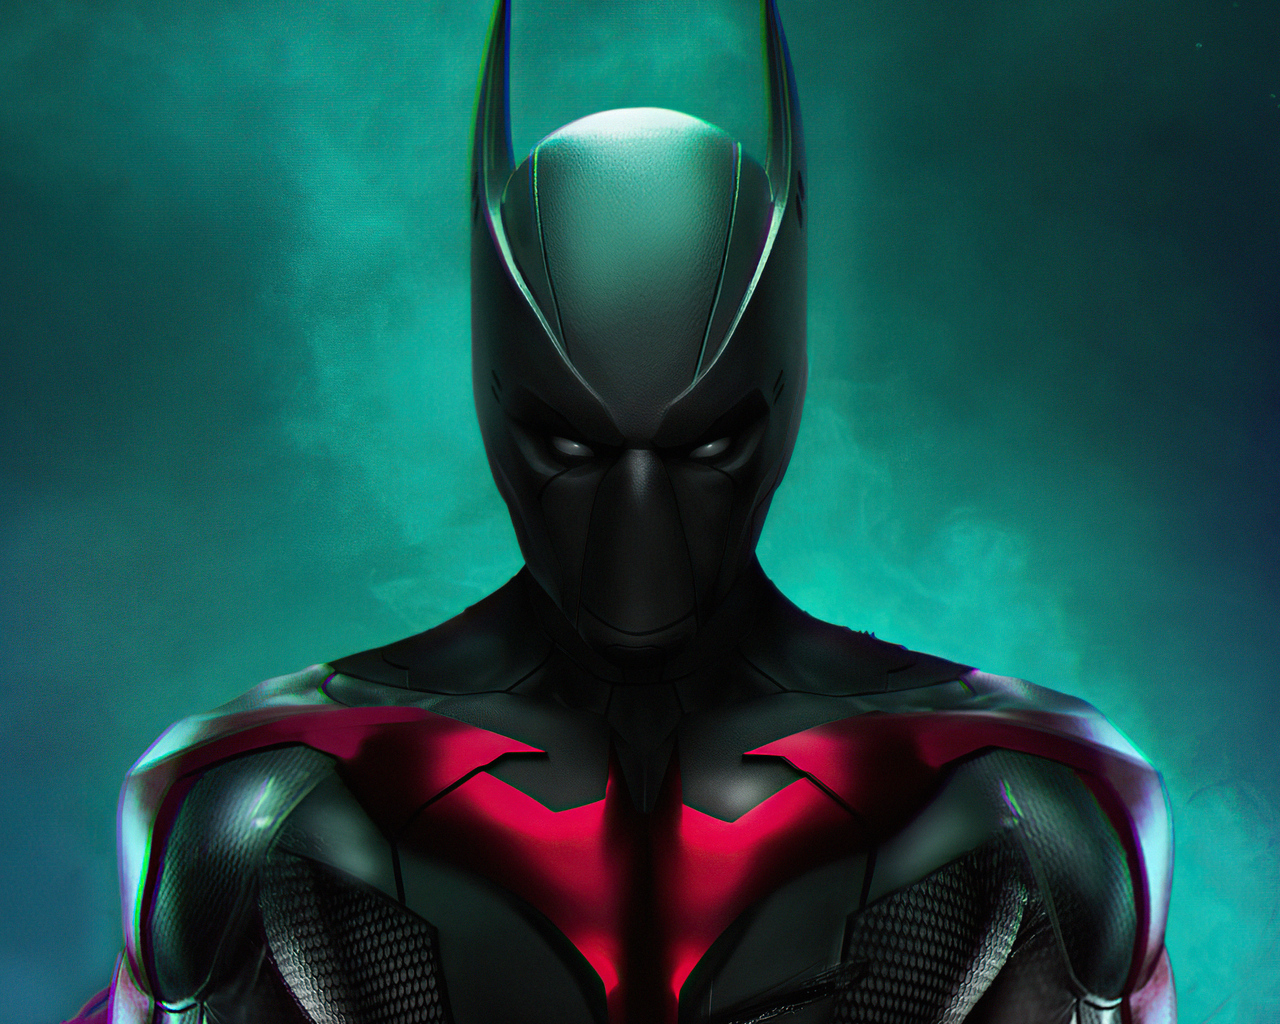 stranger-batman-beyond-4k-4b.jpg